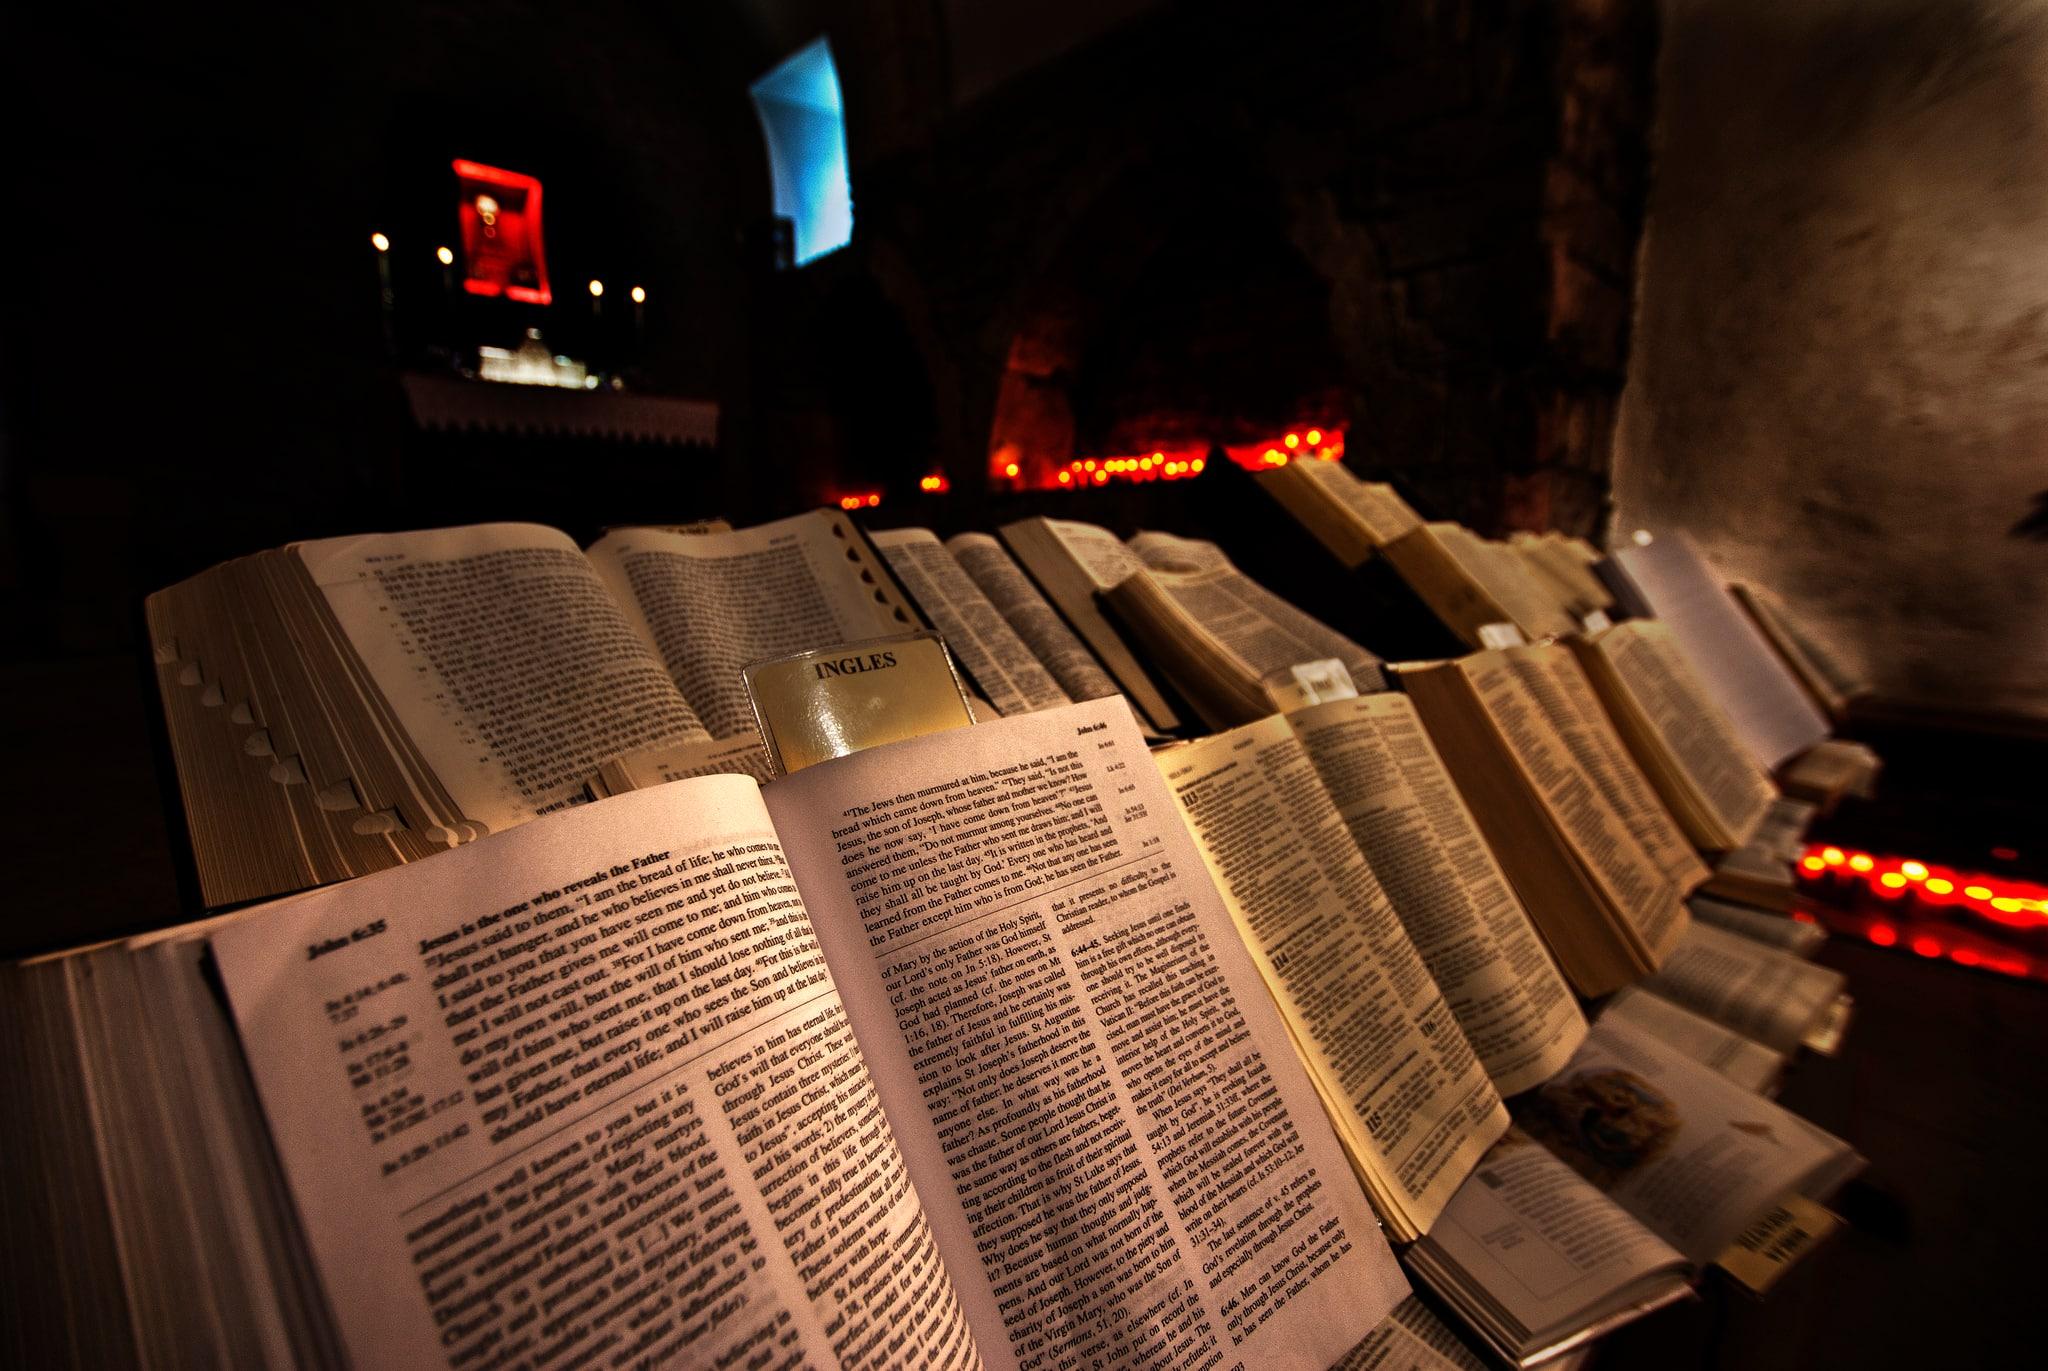 A Bíblia Sagrada Versão Digital